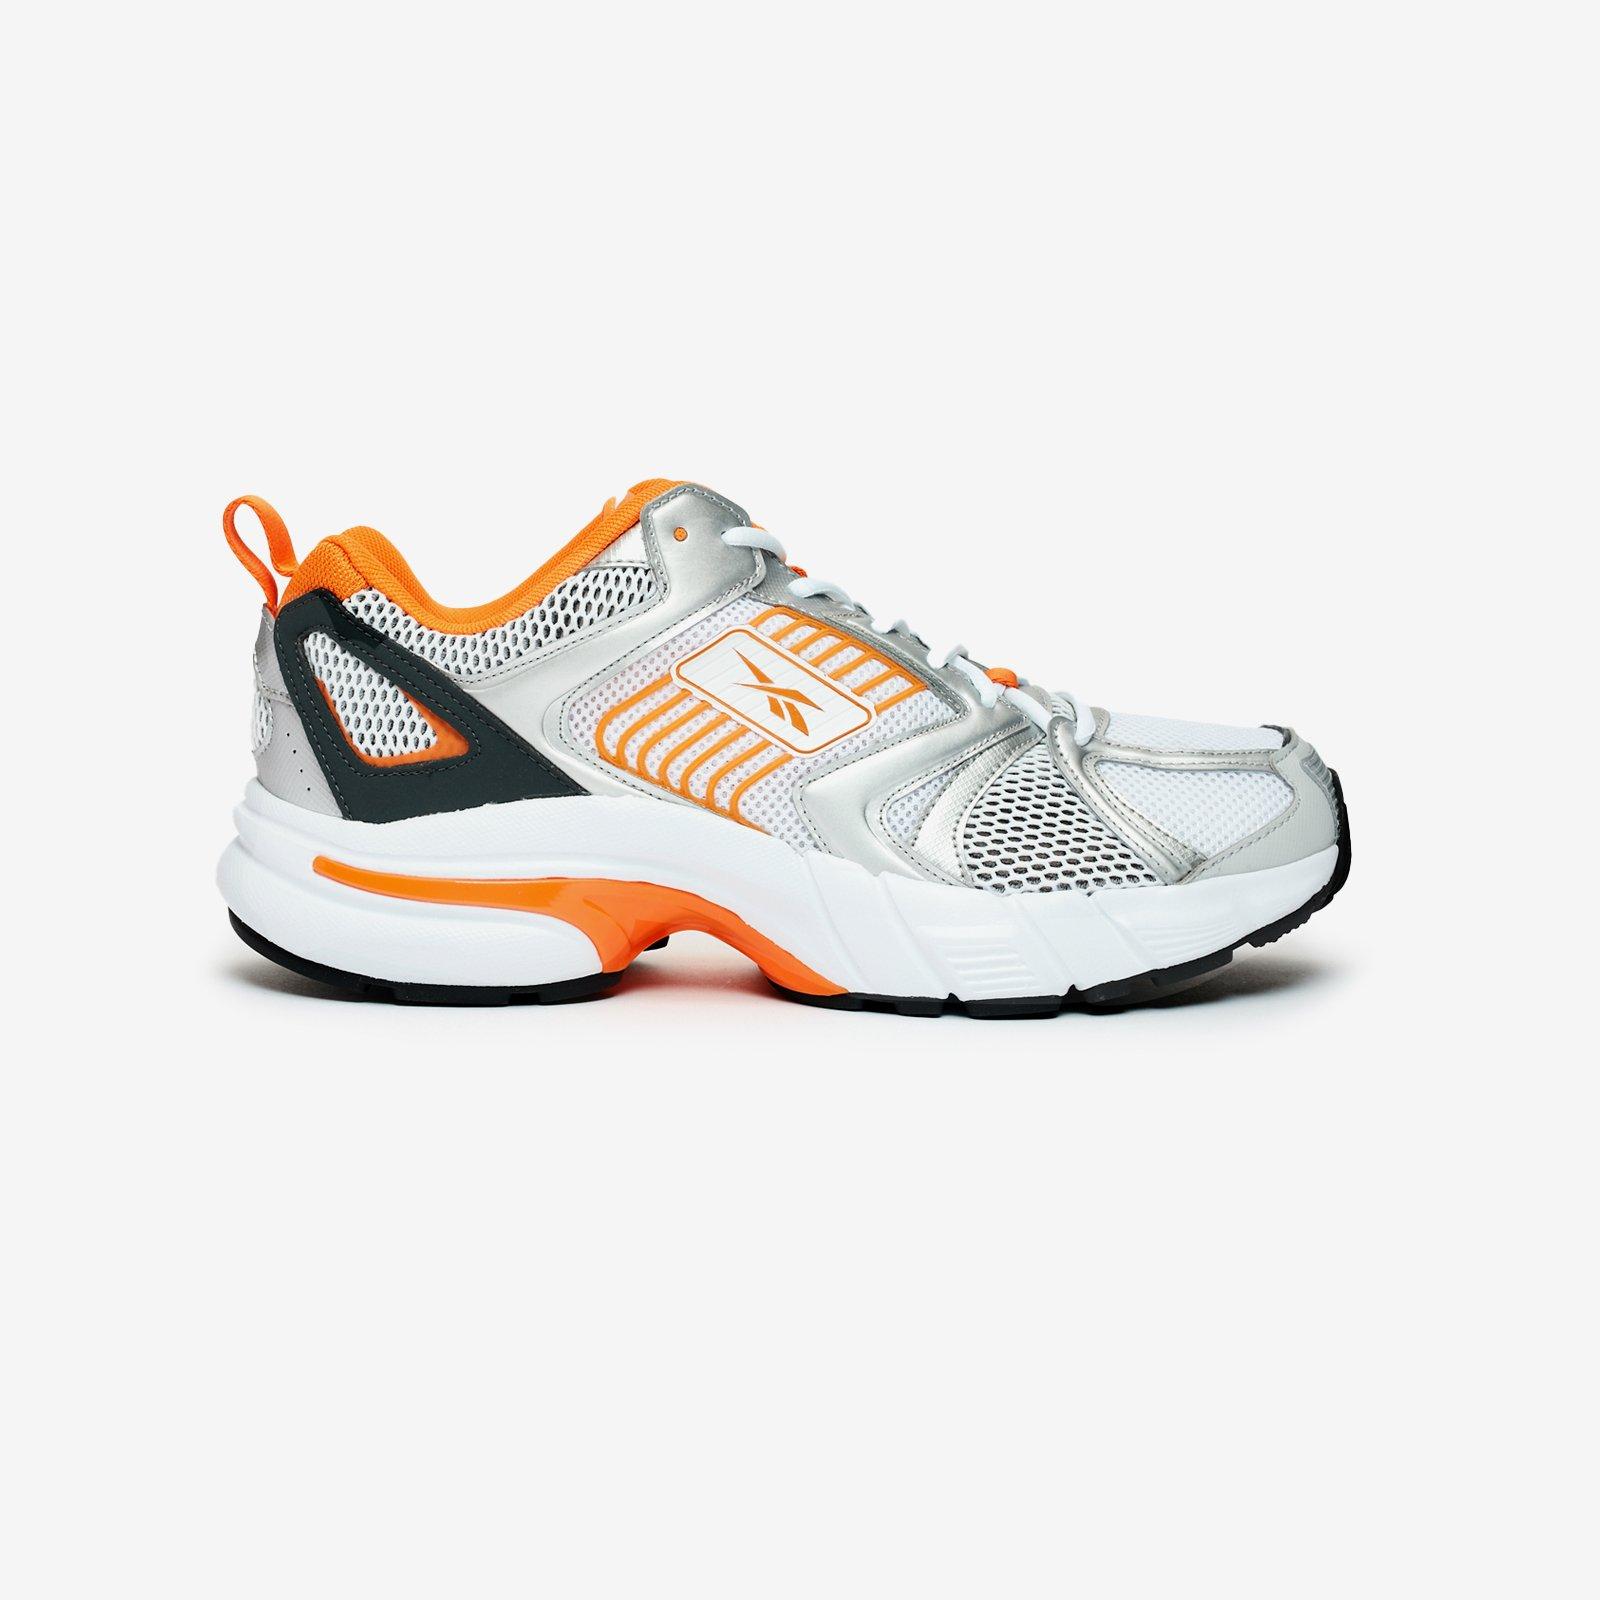 Chaussures Reebok Rbk Premier - Taille 42 au 47